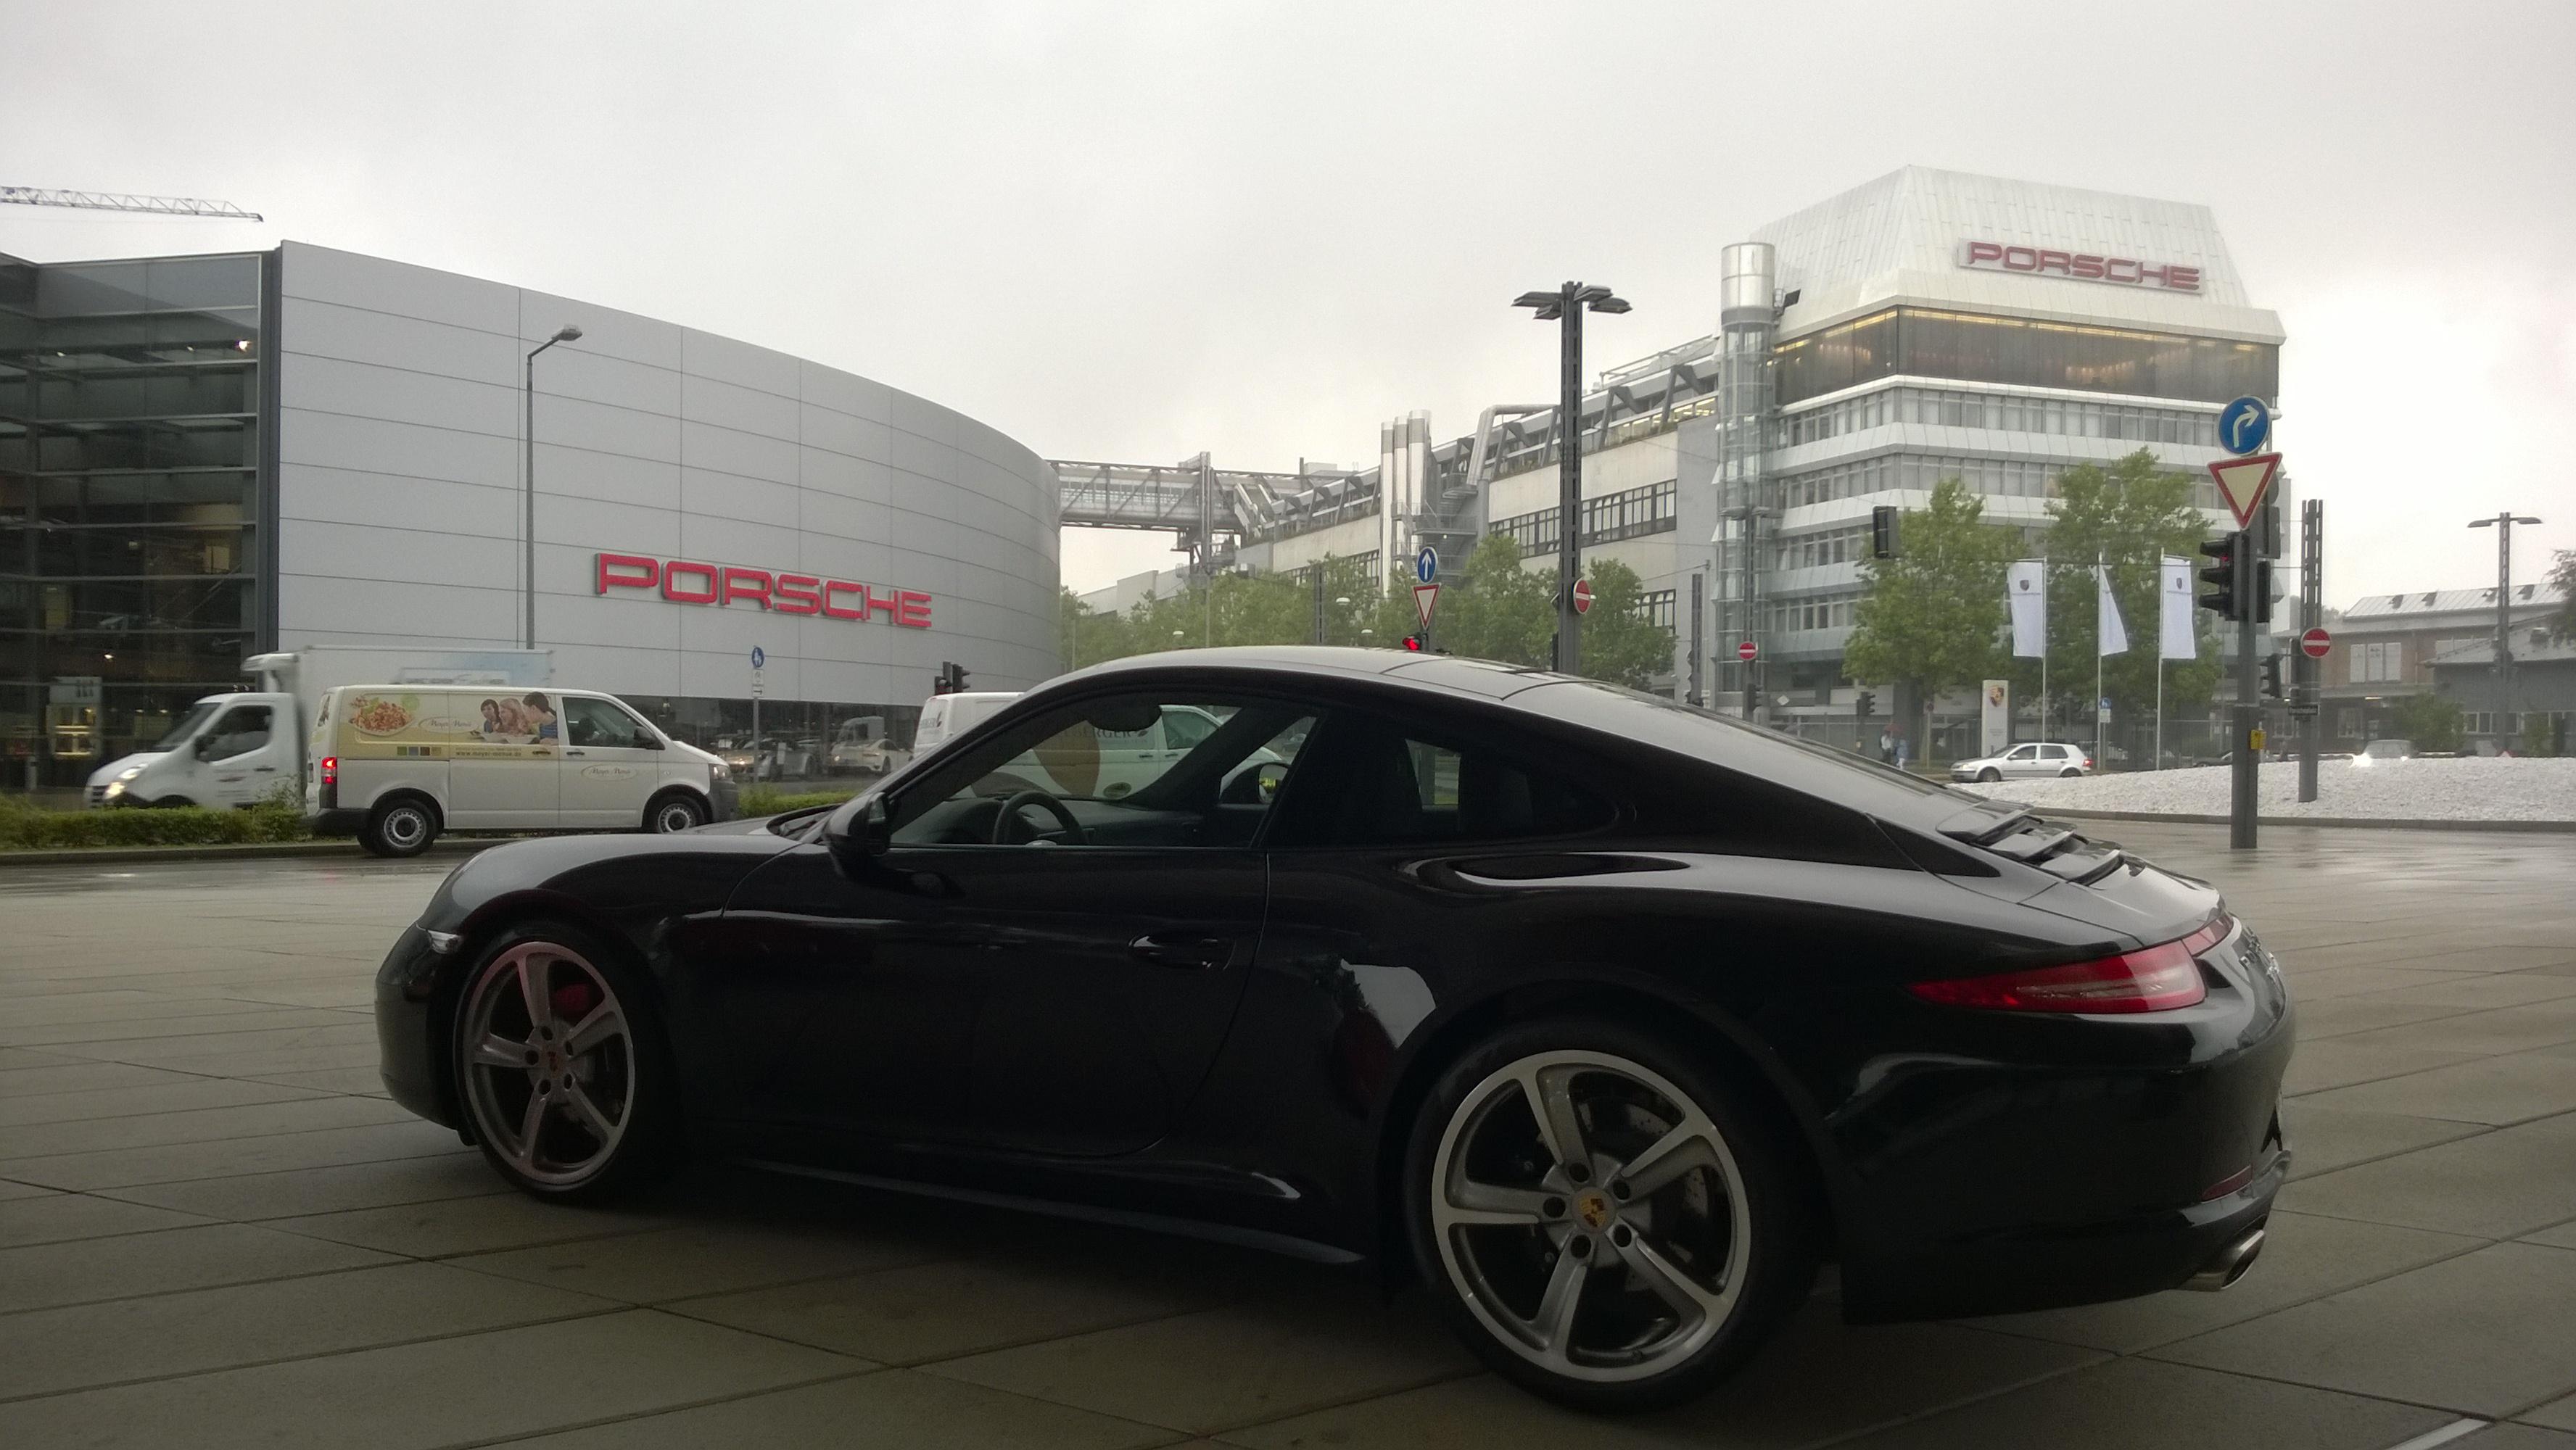 A 911 before the factory in which it was assembled, Porschewerk Stuttgart (right), and the manufacturer's central dealership, Porsche Zentrum Stuttgart (left).